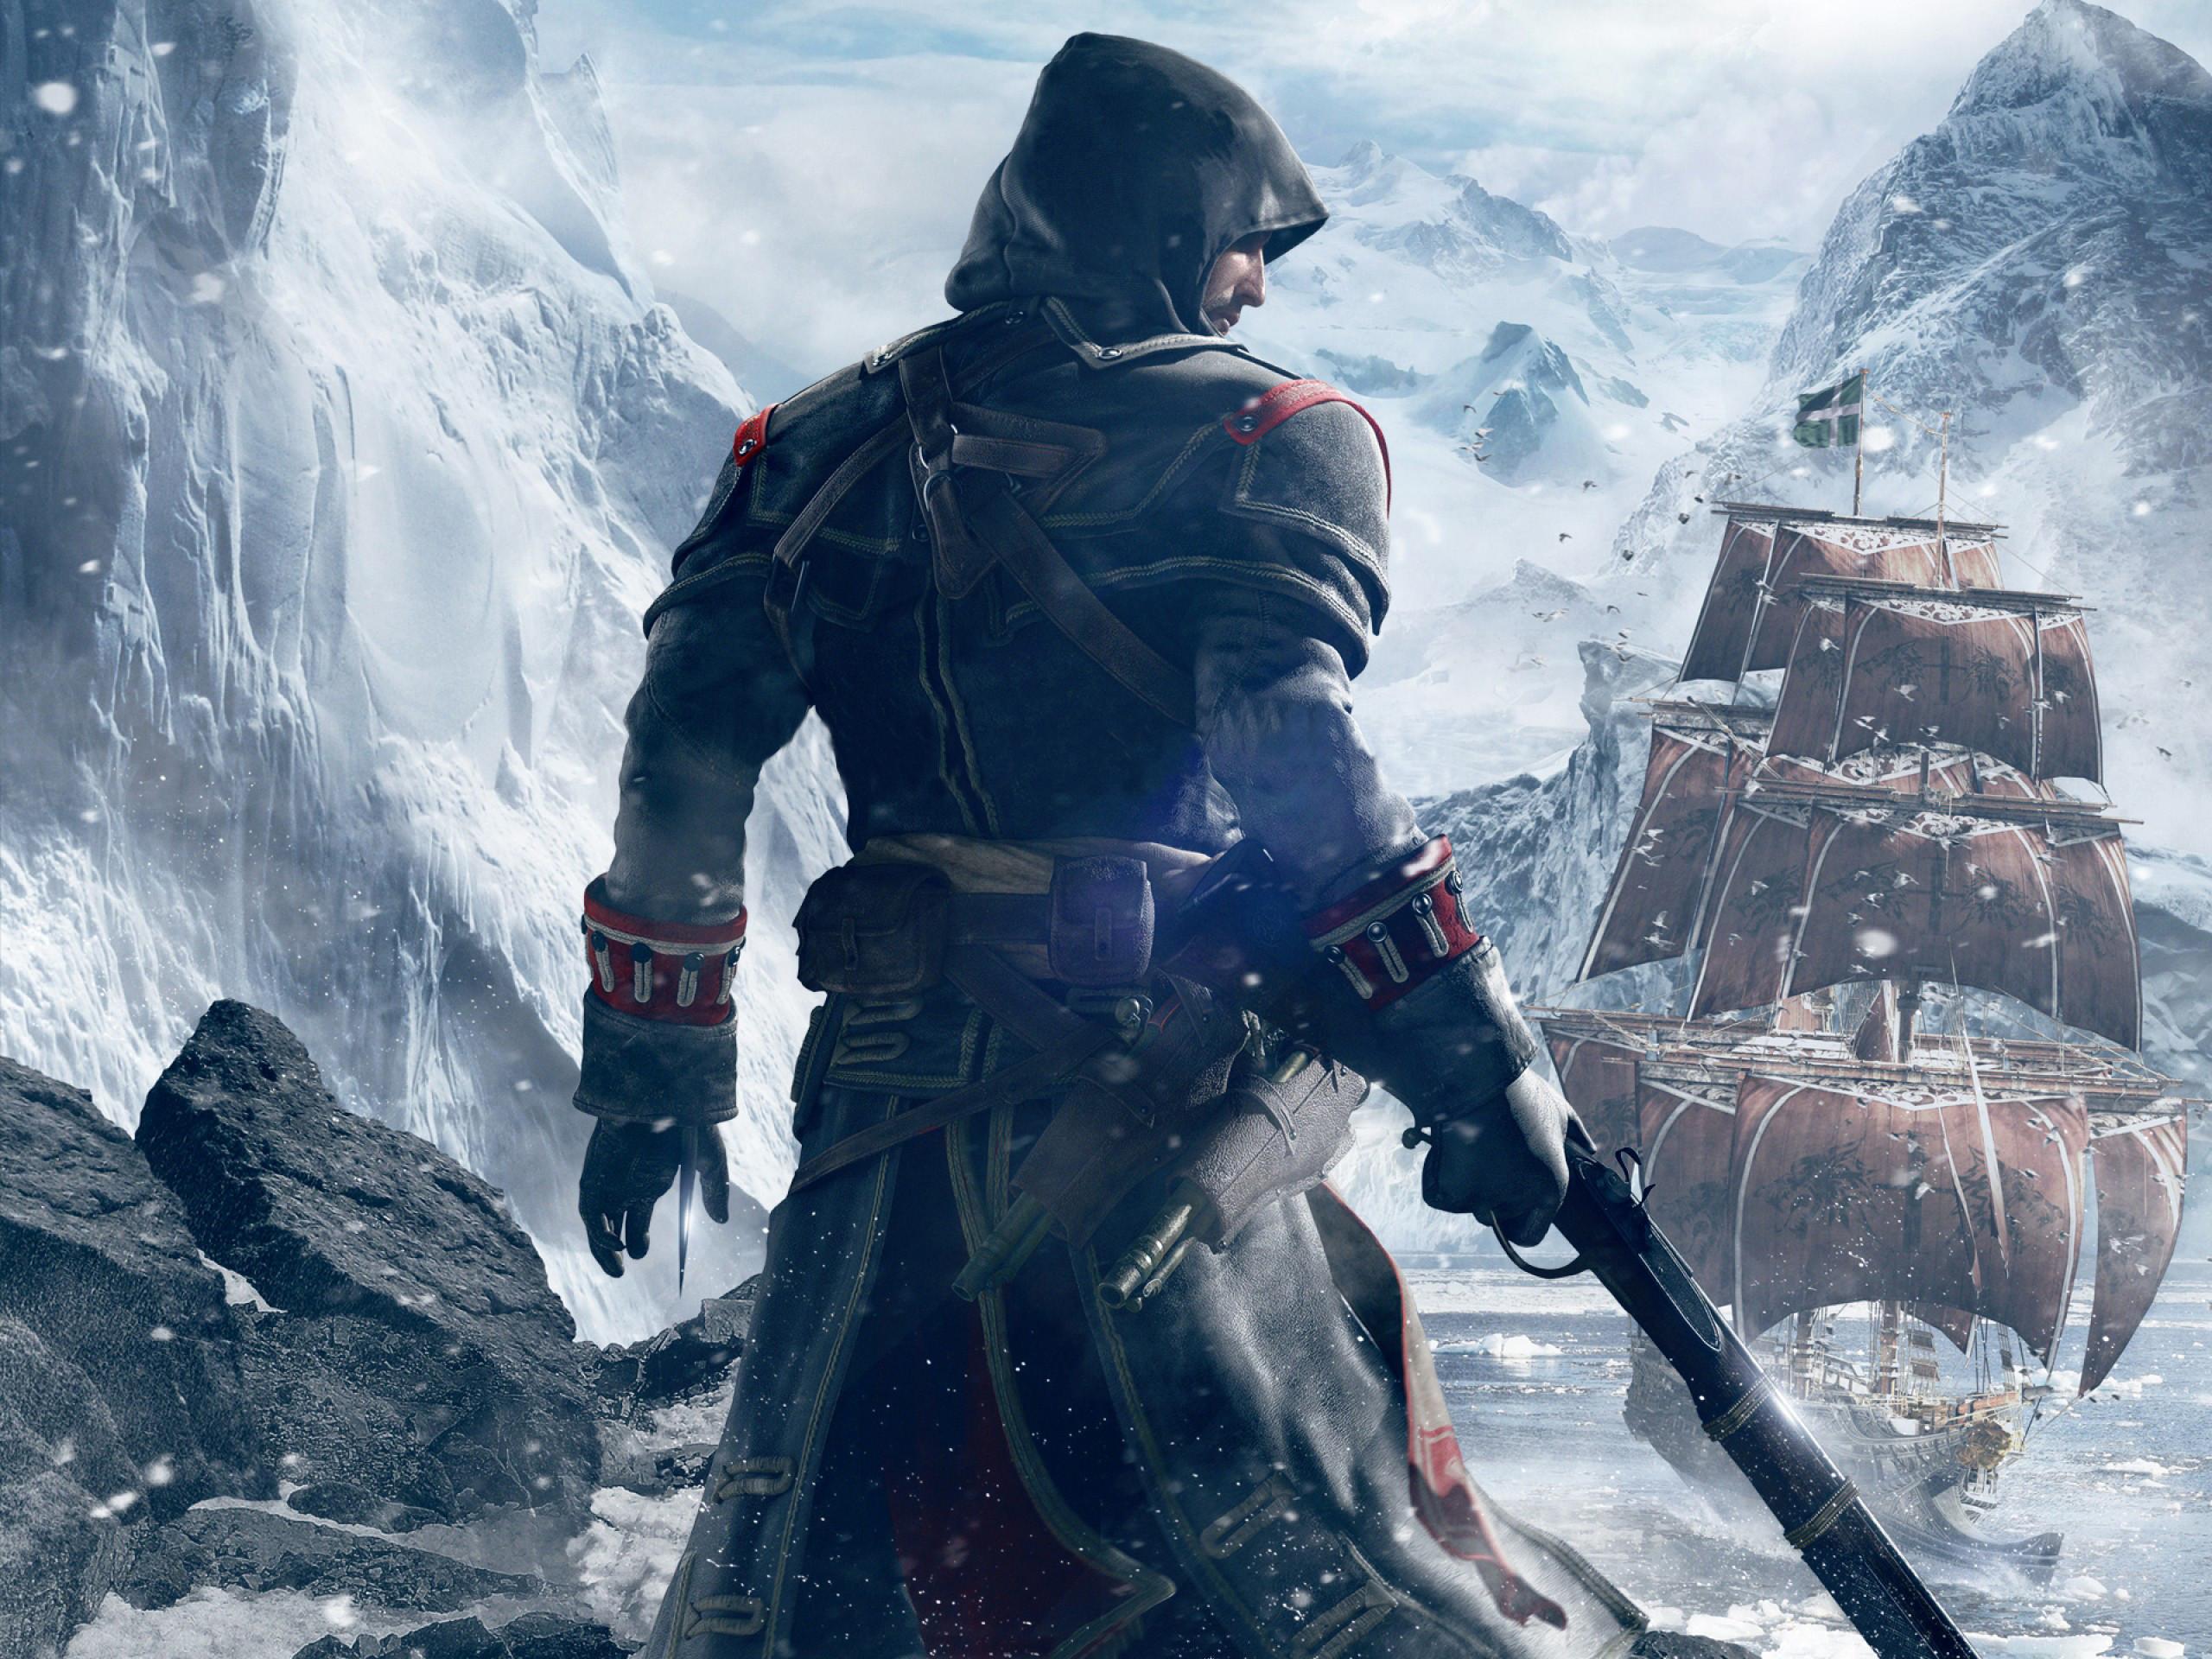 Knights Templar Wallpaper Iphone Assassin S Creed Rogue Full Hd Papel De Parede And Planos